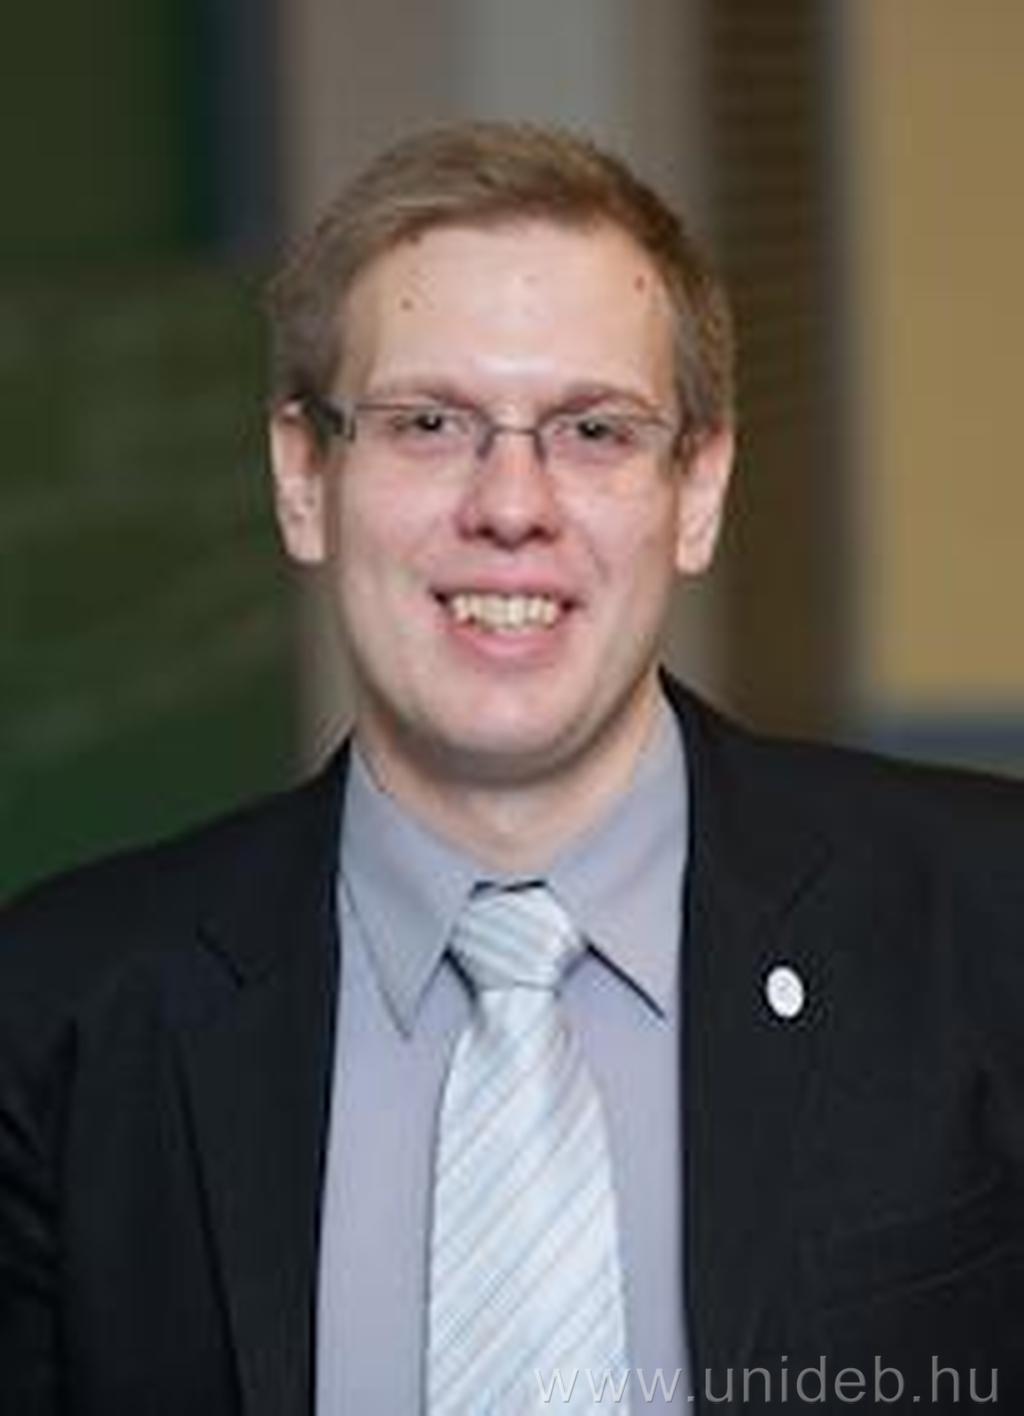 Dr. Zaccaria Márton Leó